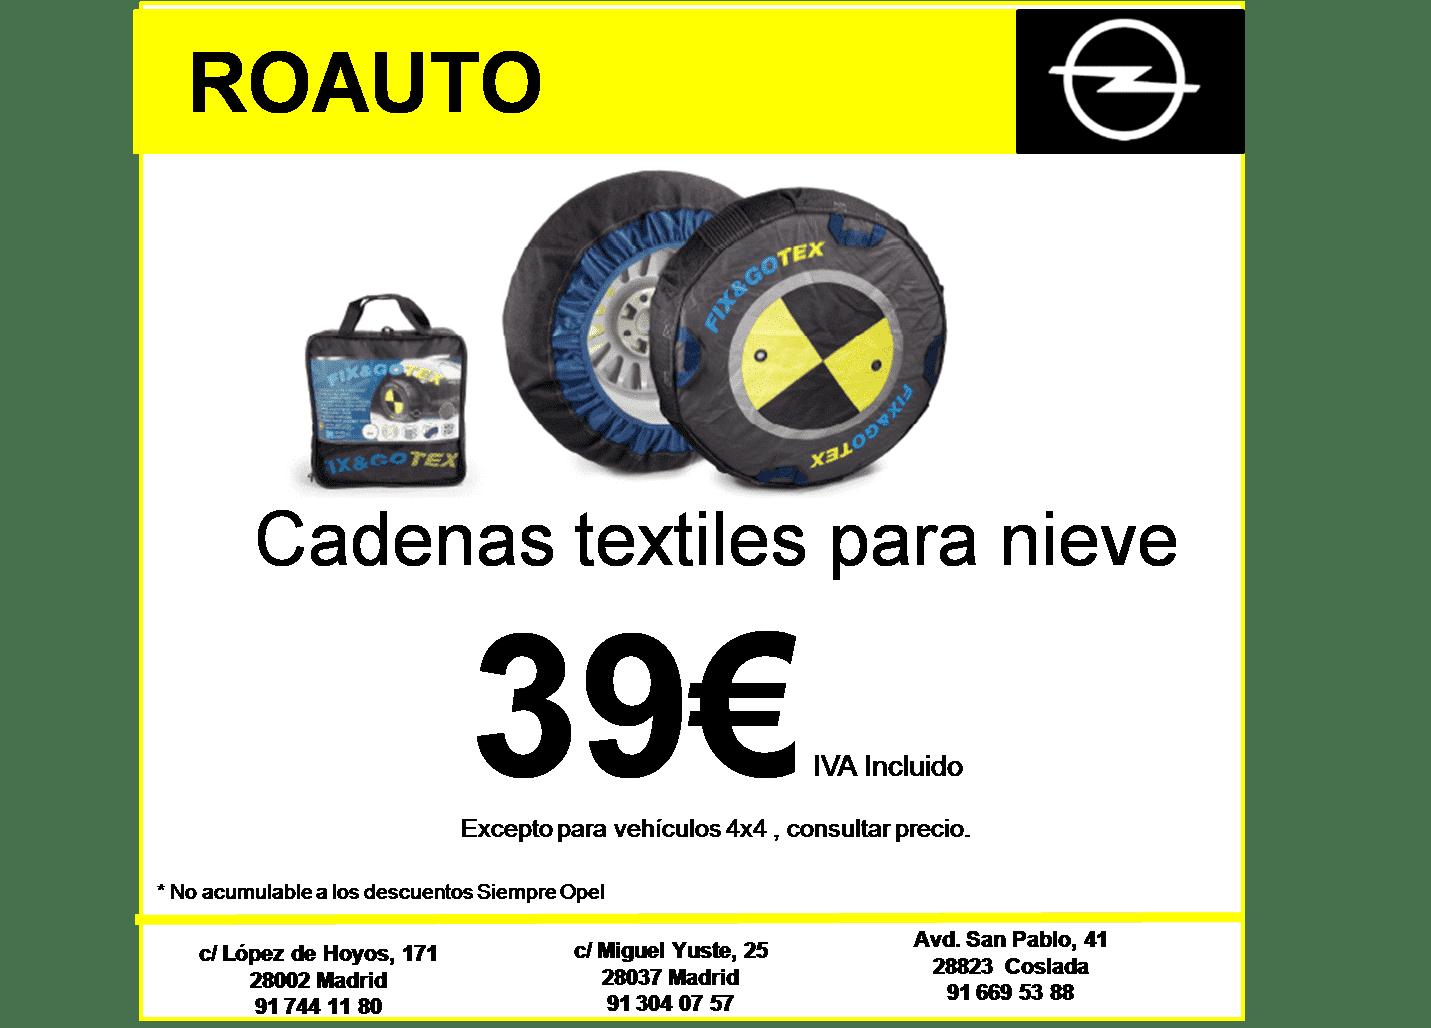 Cadenas textiles para nieve 39€ IVA Incluido